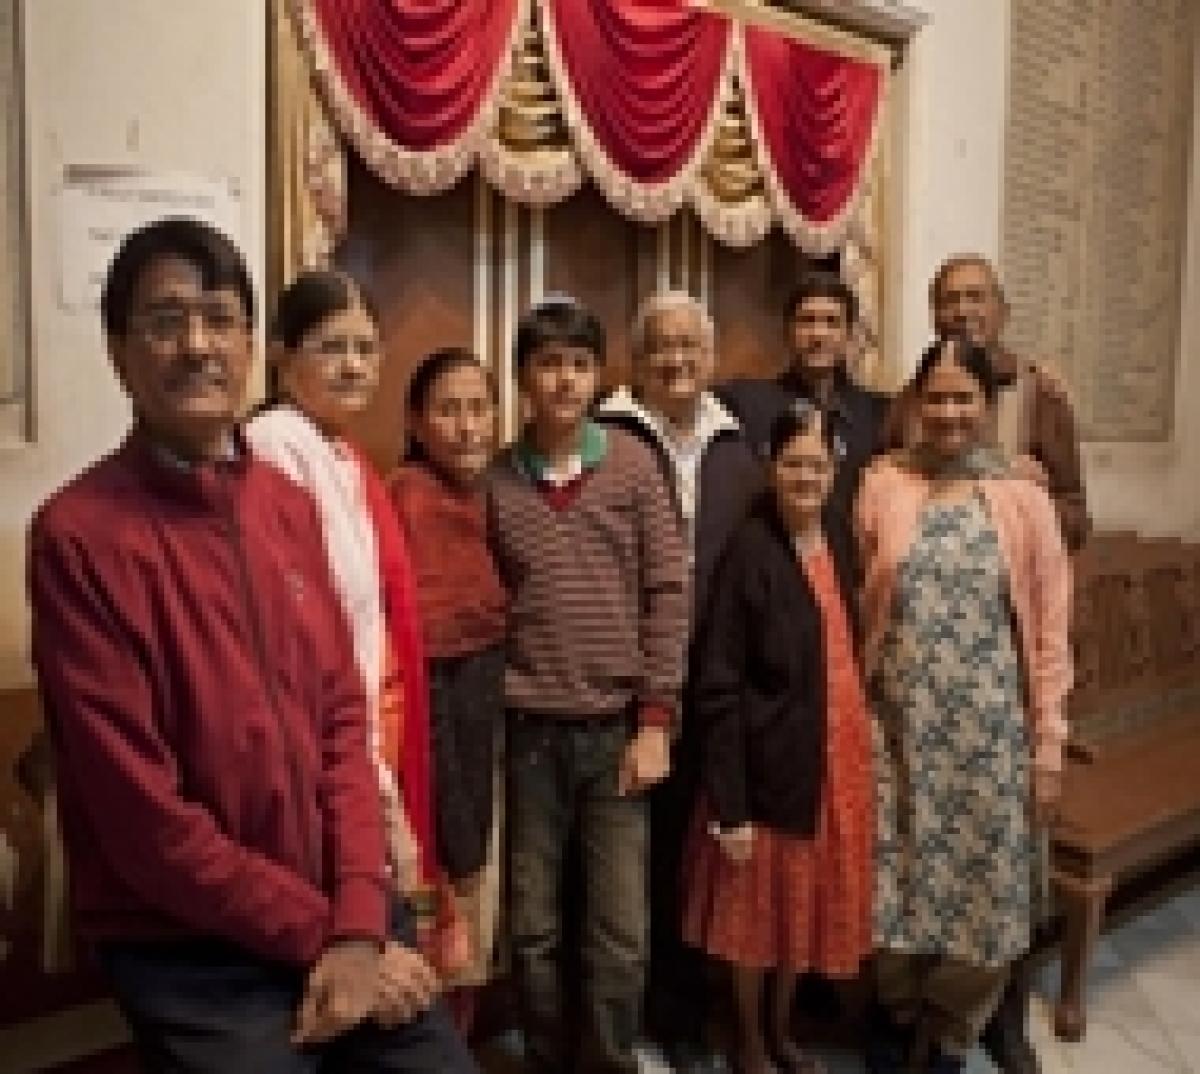 India's Bene Israel community has Jewish roots: study